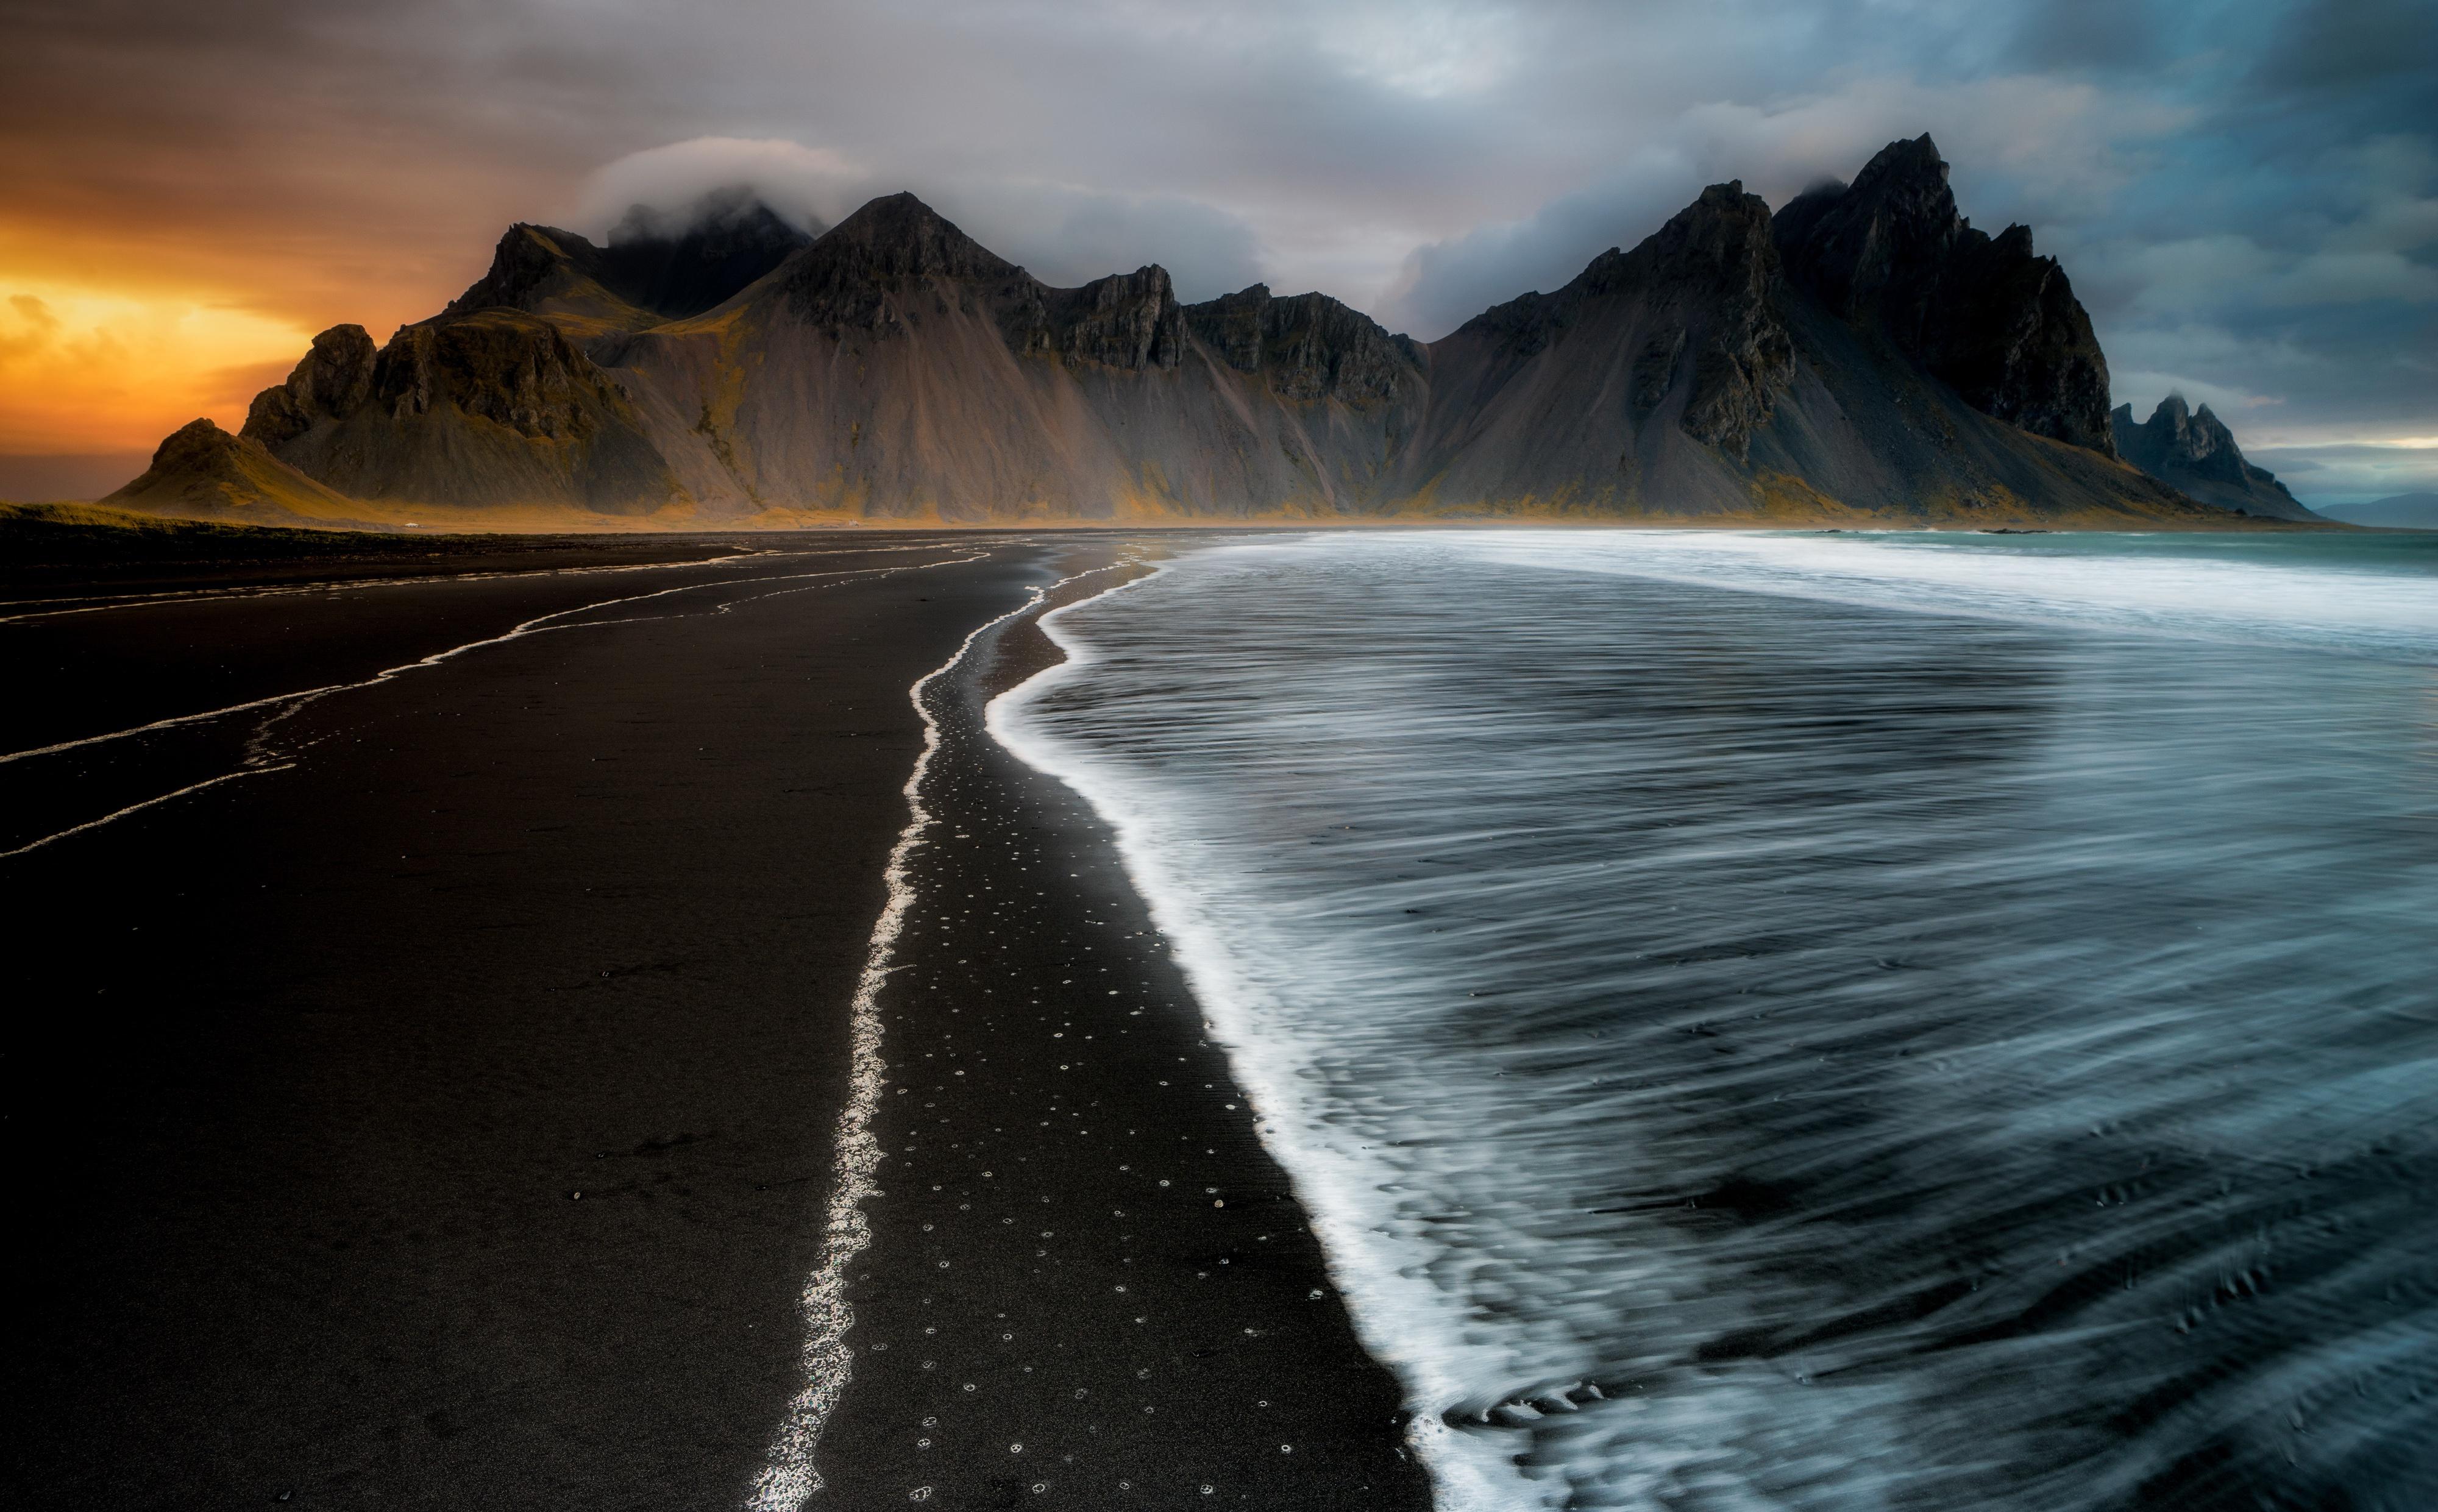 General 4000x2481 water nature Iceland coast sea dark